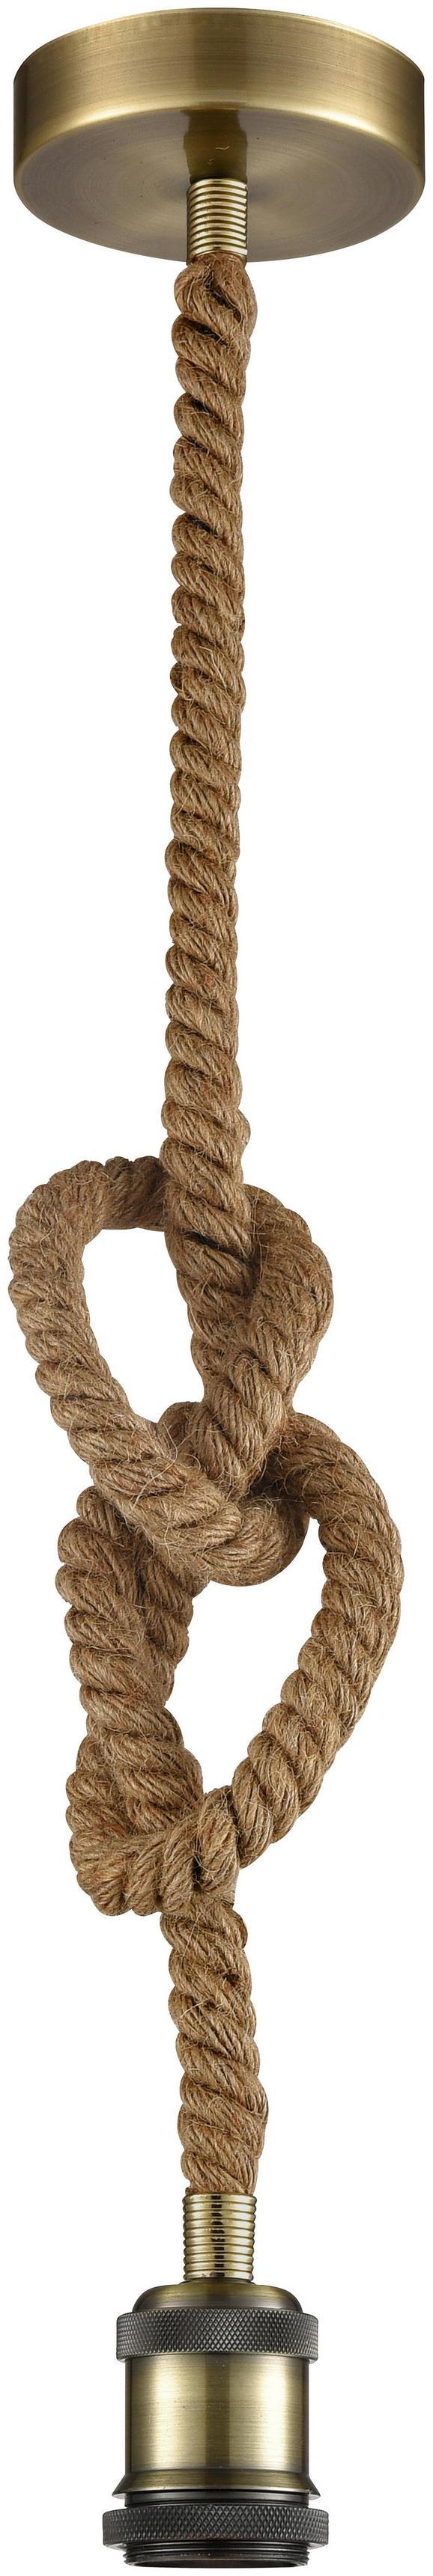 Schnurpendel Christian Braun - Braun, LIFESTYLE, Textil (120cm) - Modern Living